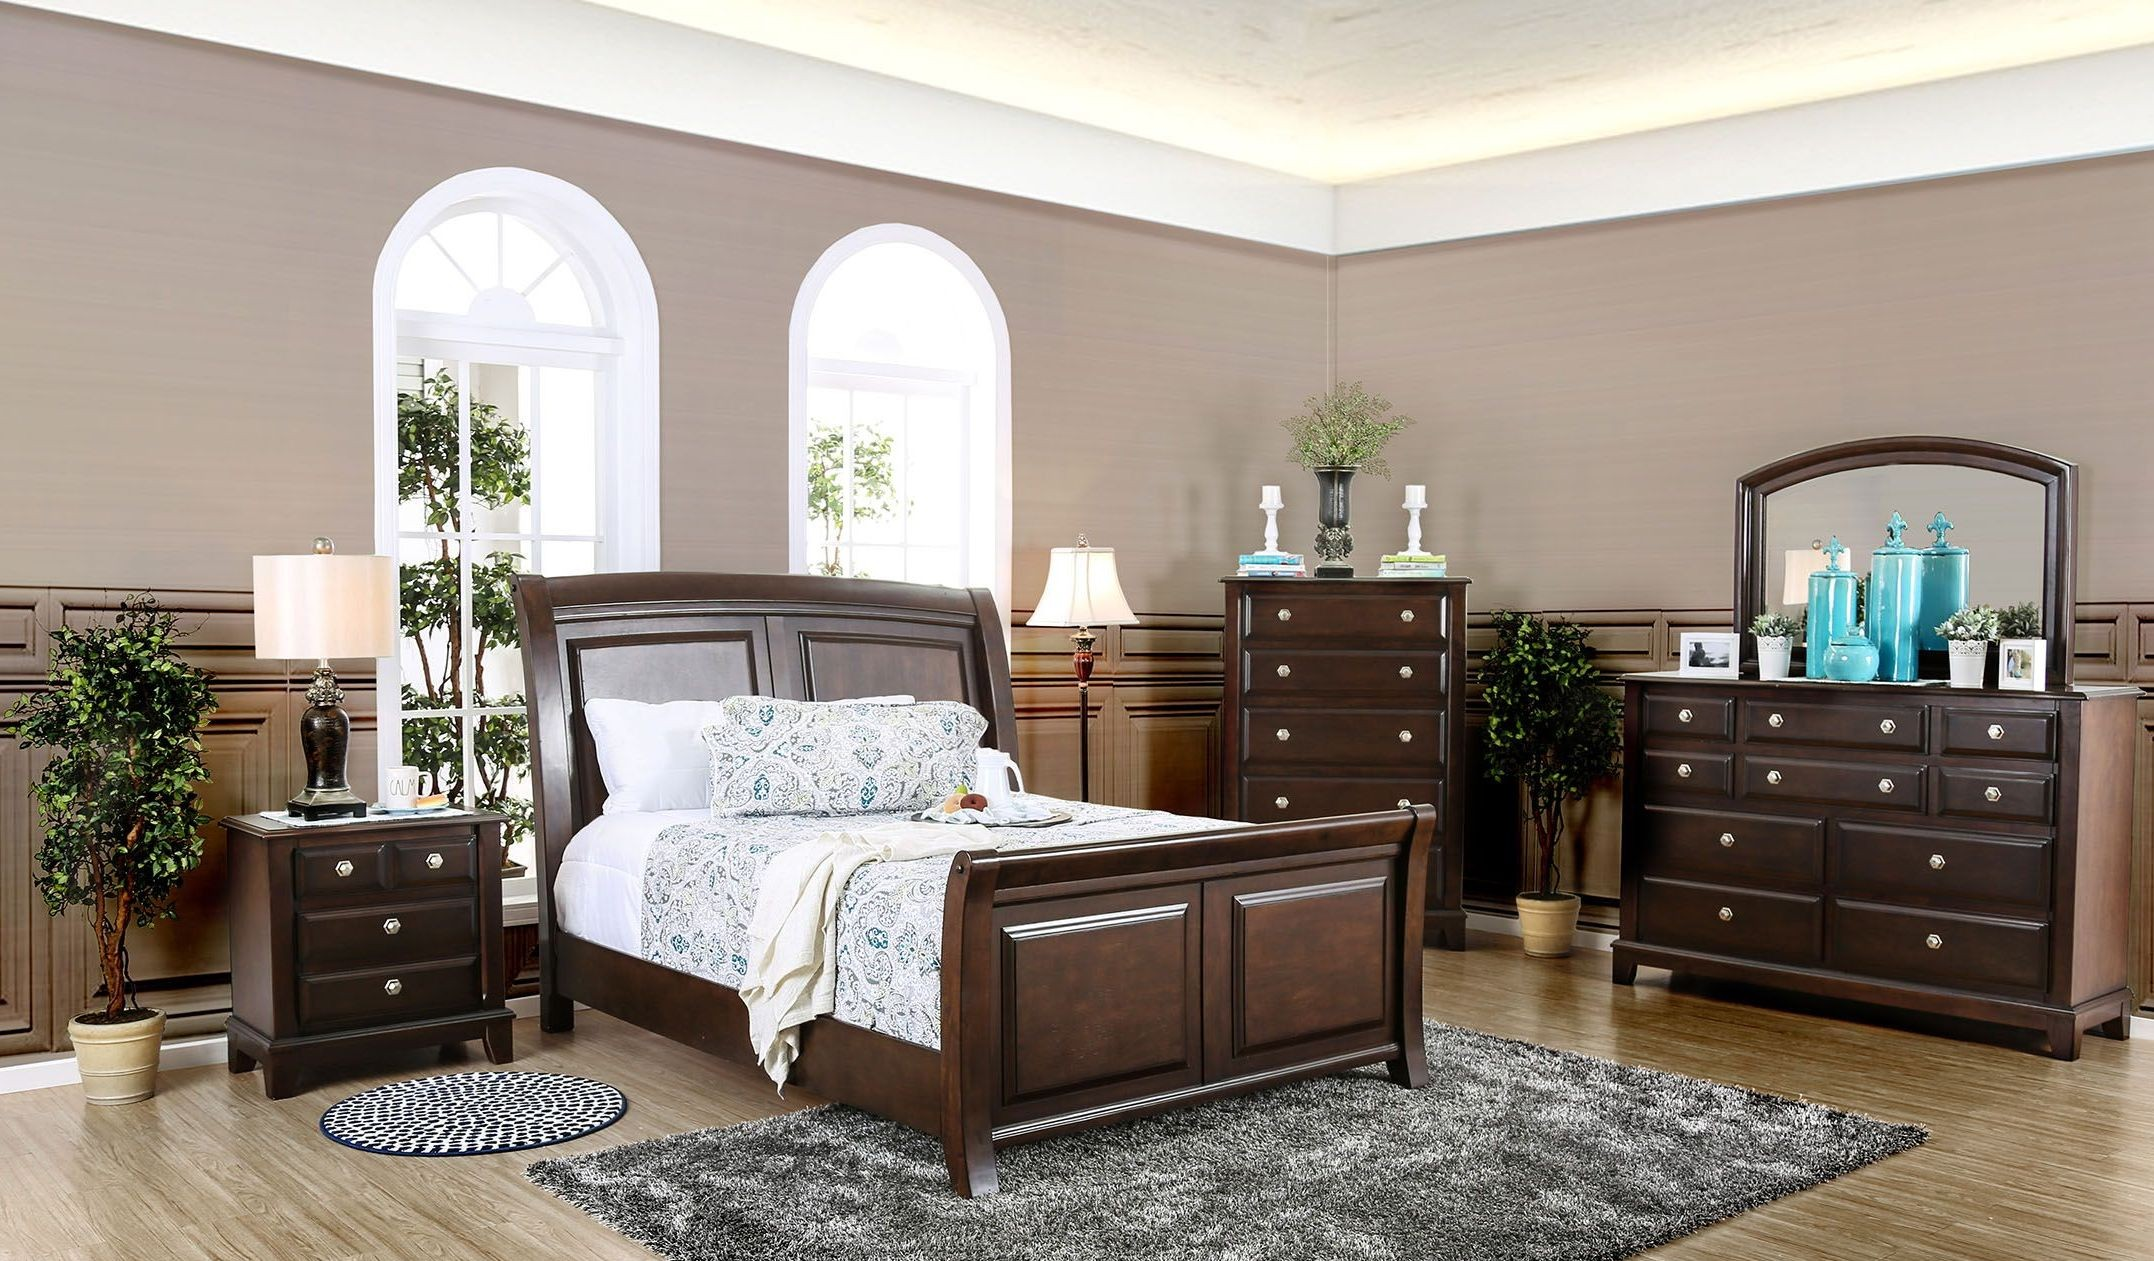 Litchville Brown Cherry Sleigh Bedroom Set From Furniture